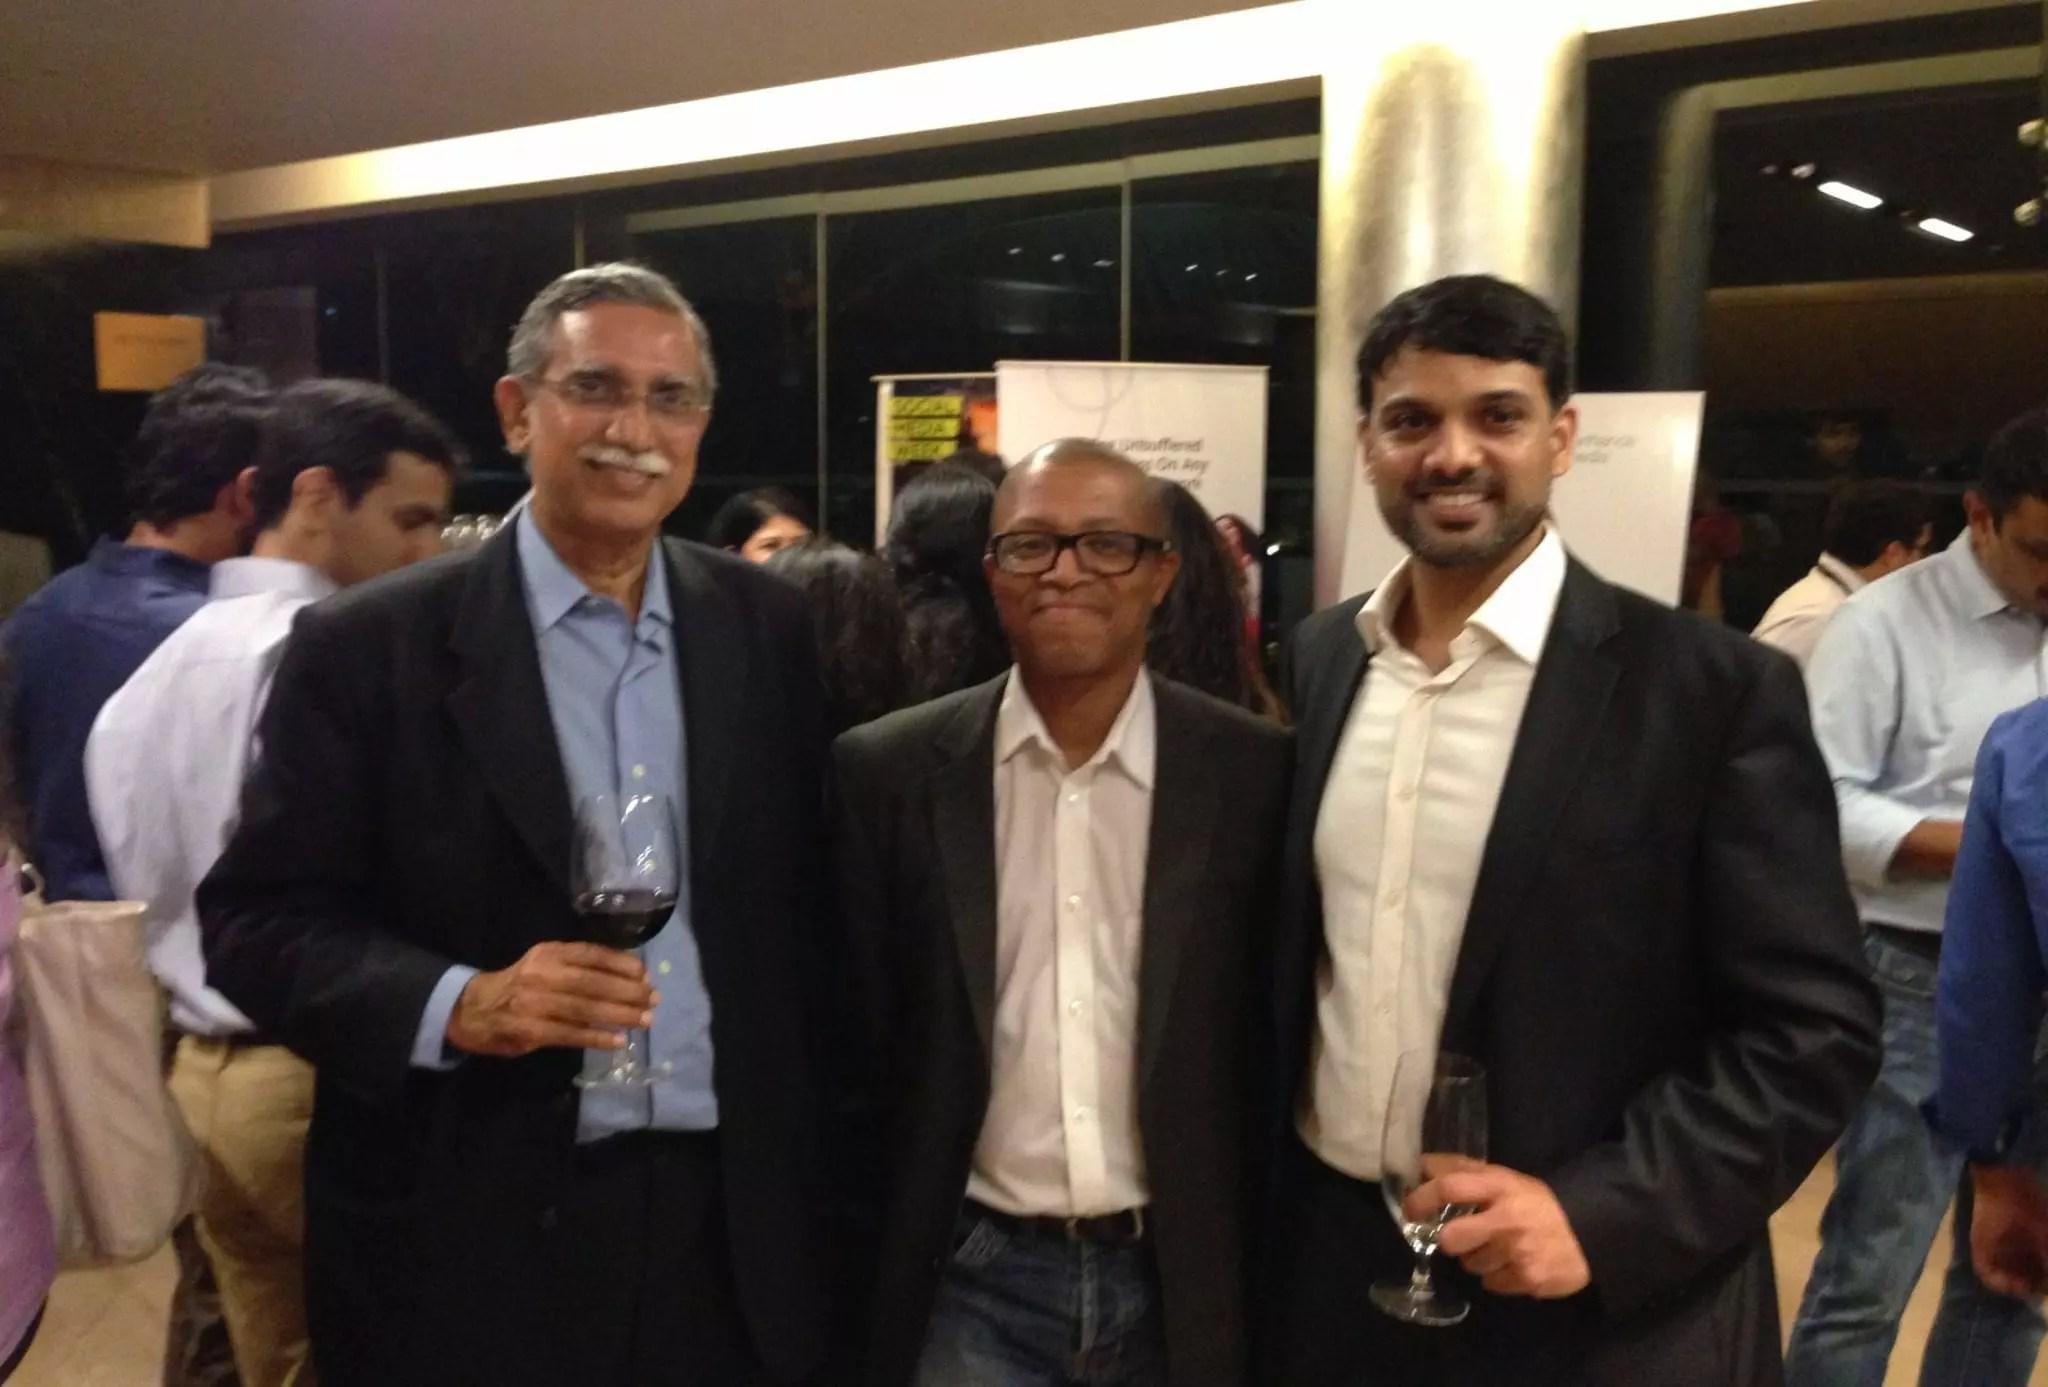 eNitiate   SMW Mumbai 2013   Bra Willy Seyama and Ranjit Nair   Sep 2013